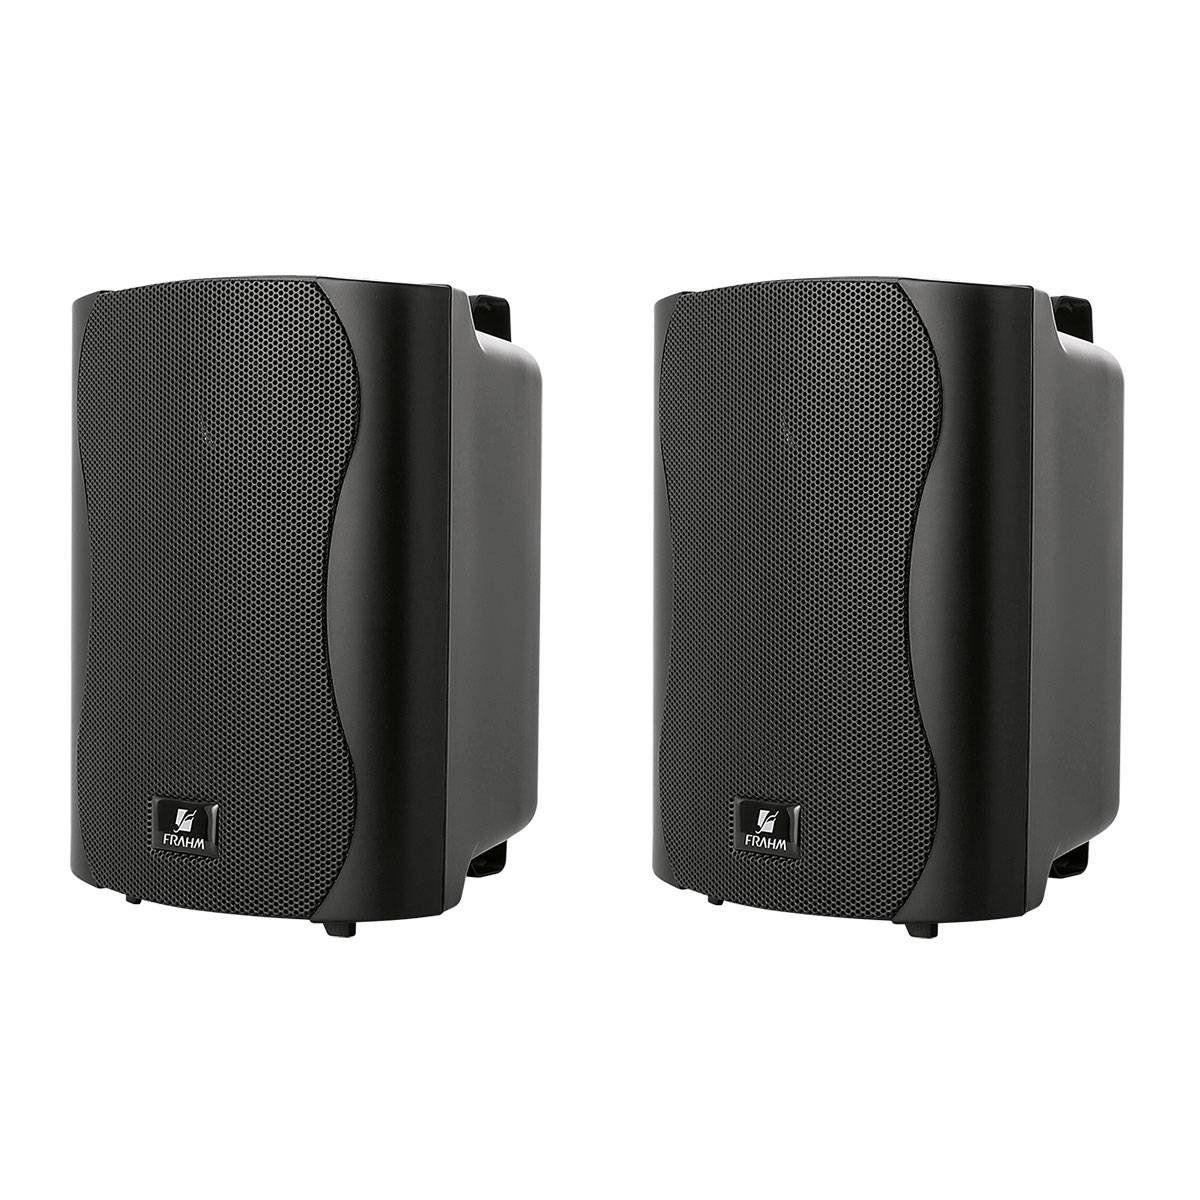 Caixa Passiva p/ Som Ambiente Fal 4 Pol 40W c/ Suporte (Par) - PS 4 Plus Frahm